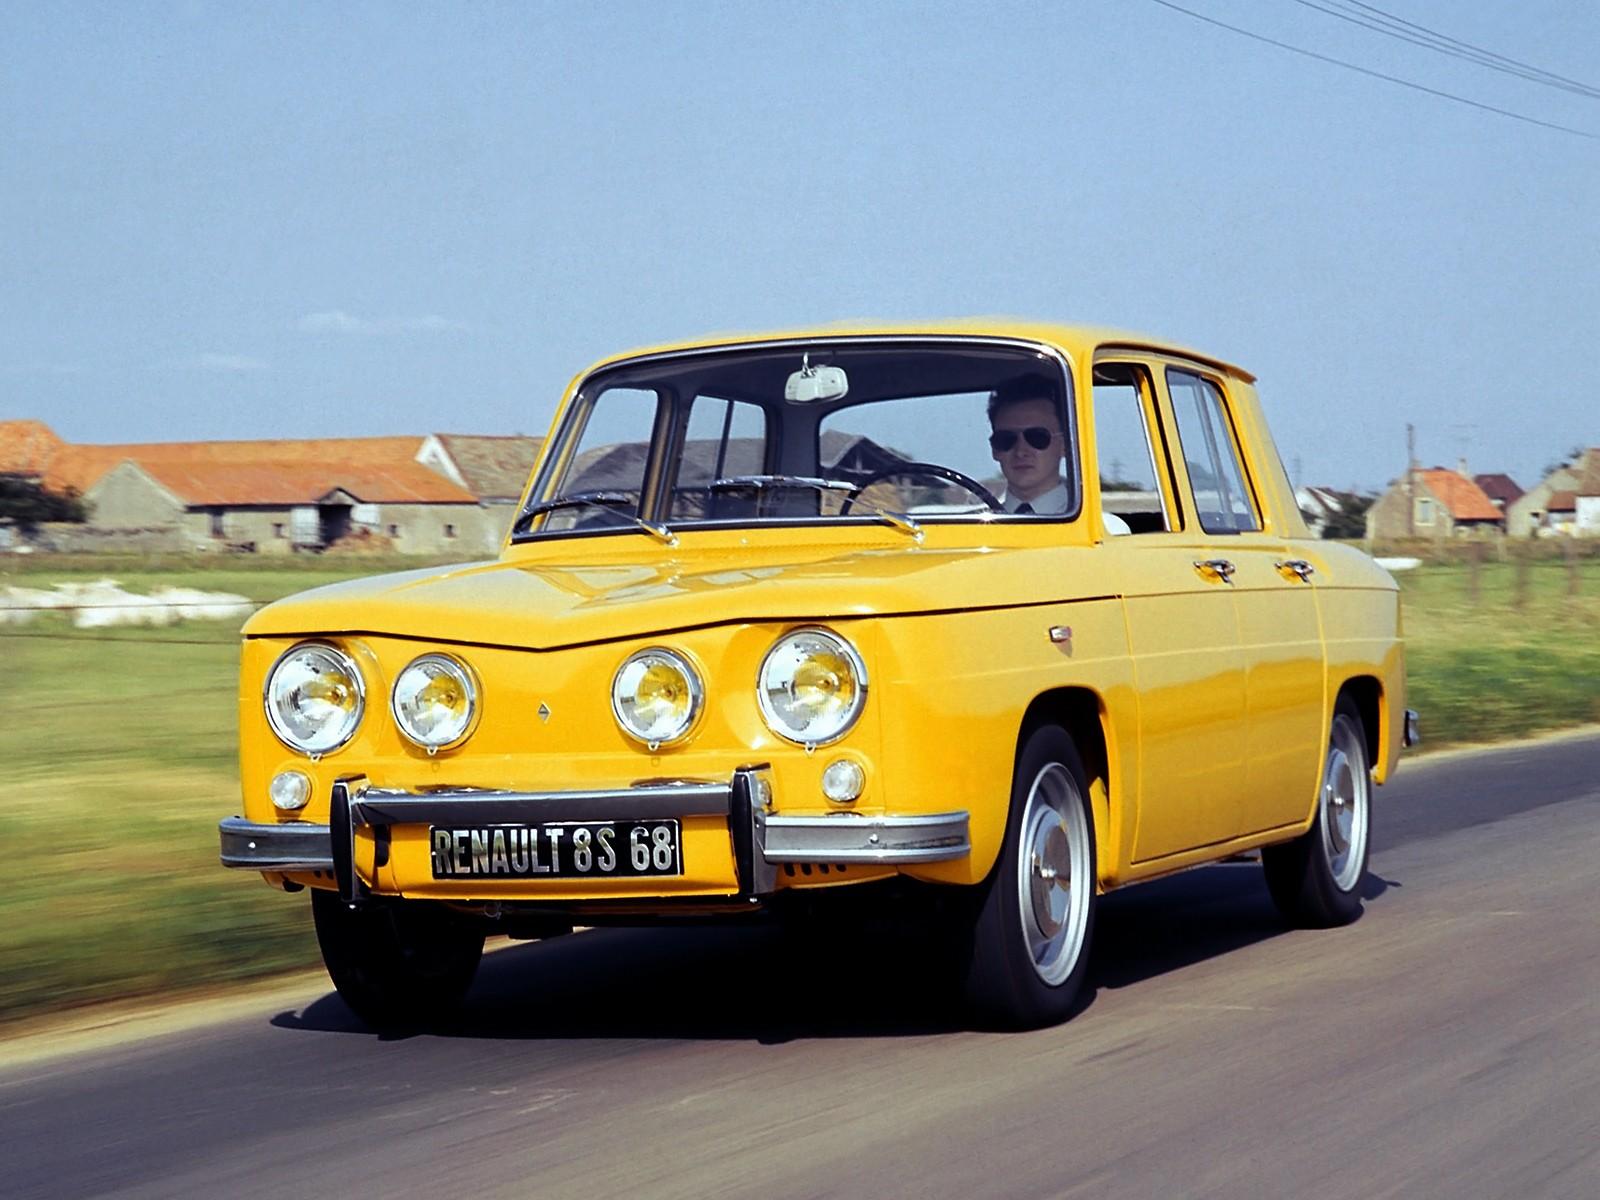 Alpine Auto Sales >> RENAULT 8 specs - 1962, 1963, 1964, 1965, 1966, 1967, 1968, 1969, 1970, 1971 - autoevolution